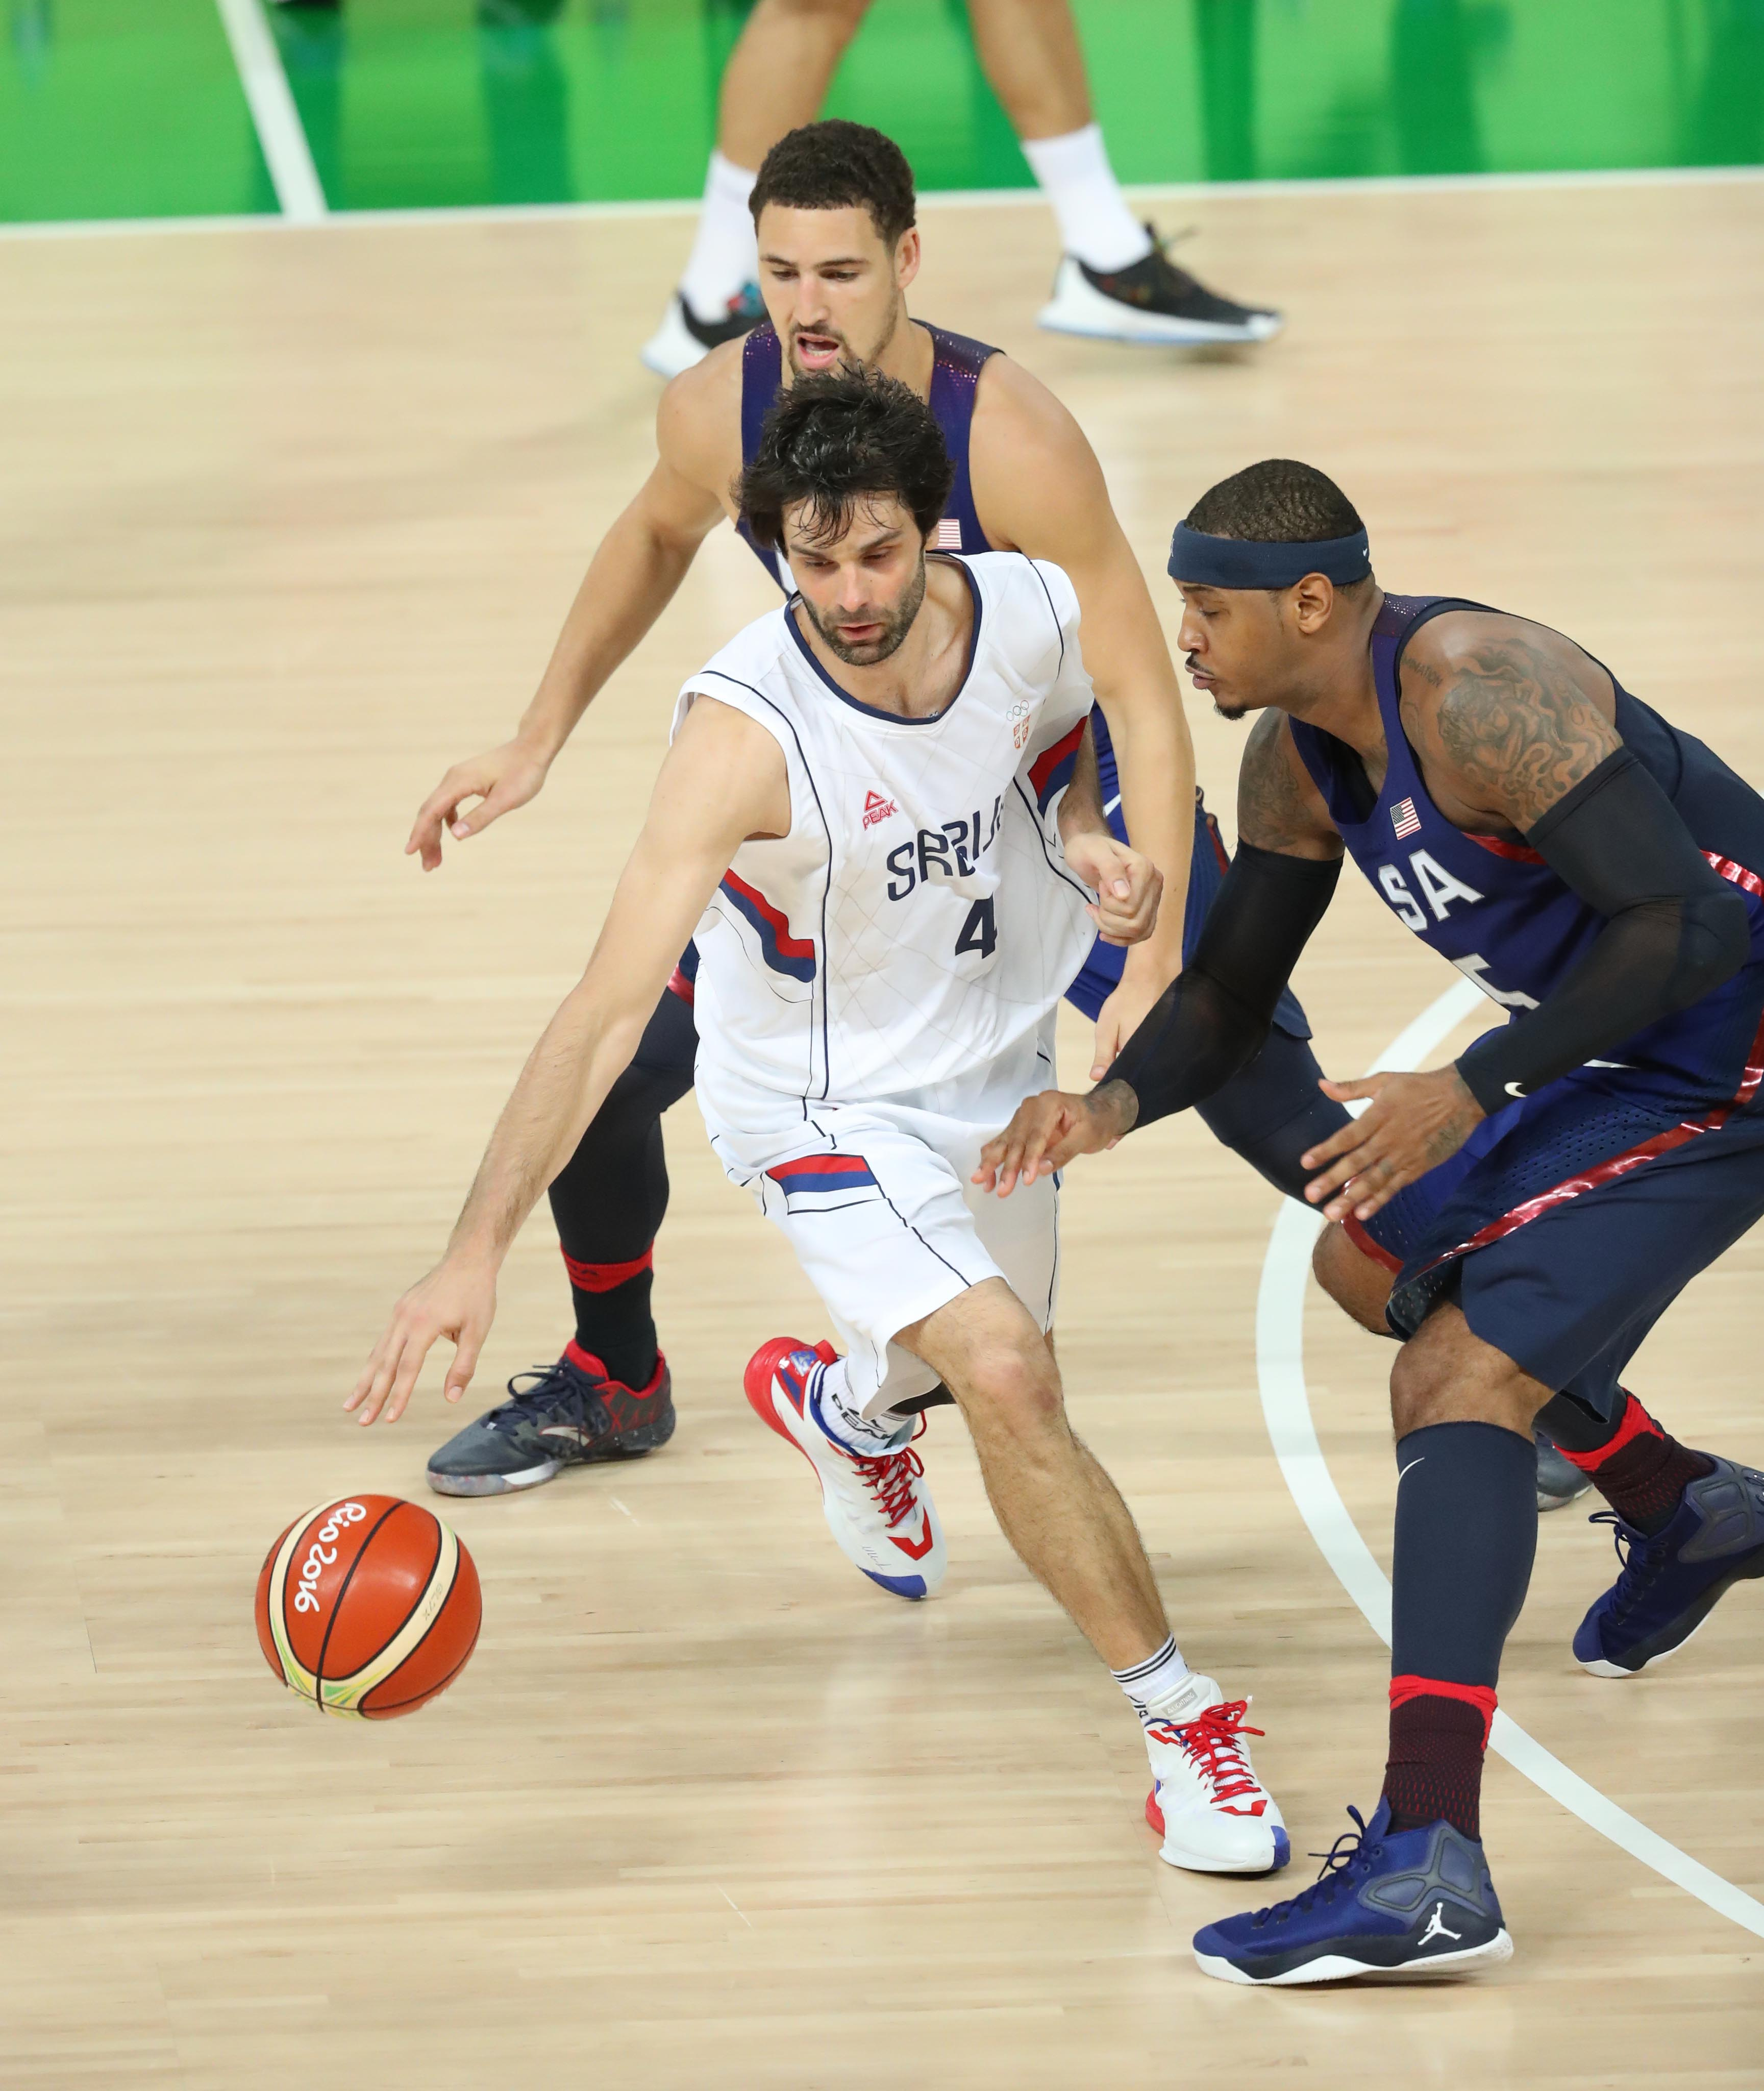 9495911-olympics-basketball-mens-team-final-srb-vs-usa